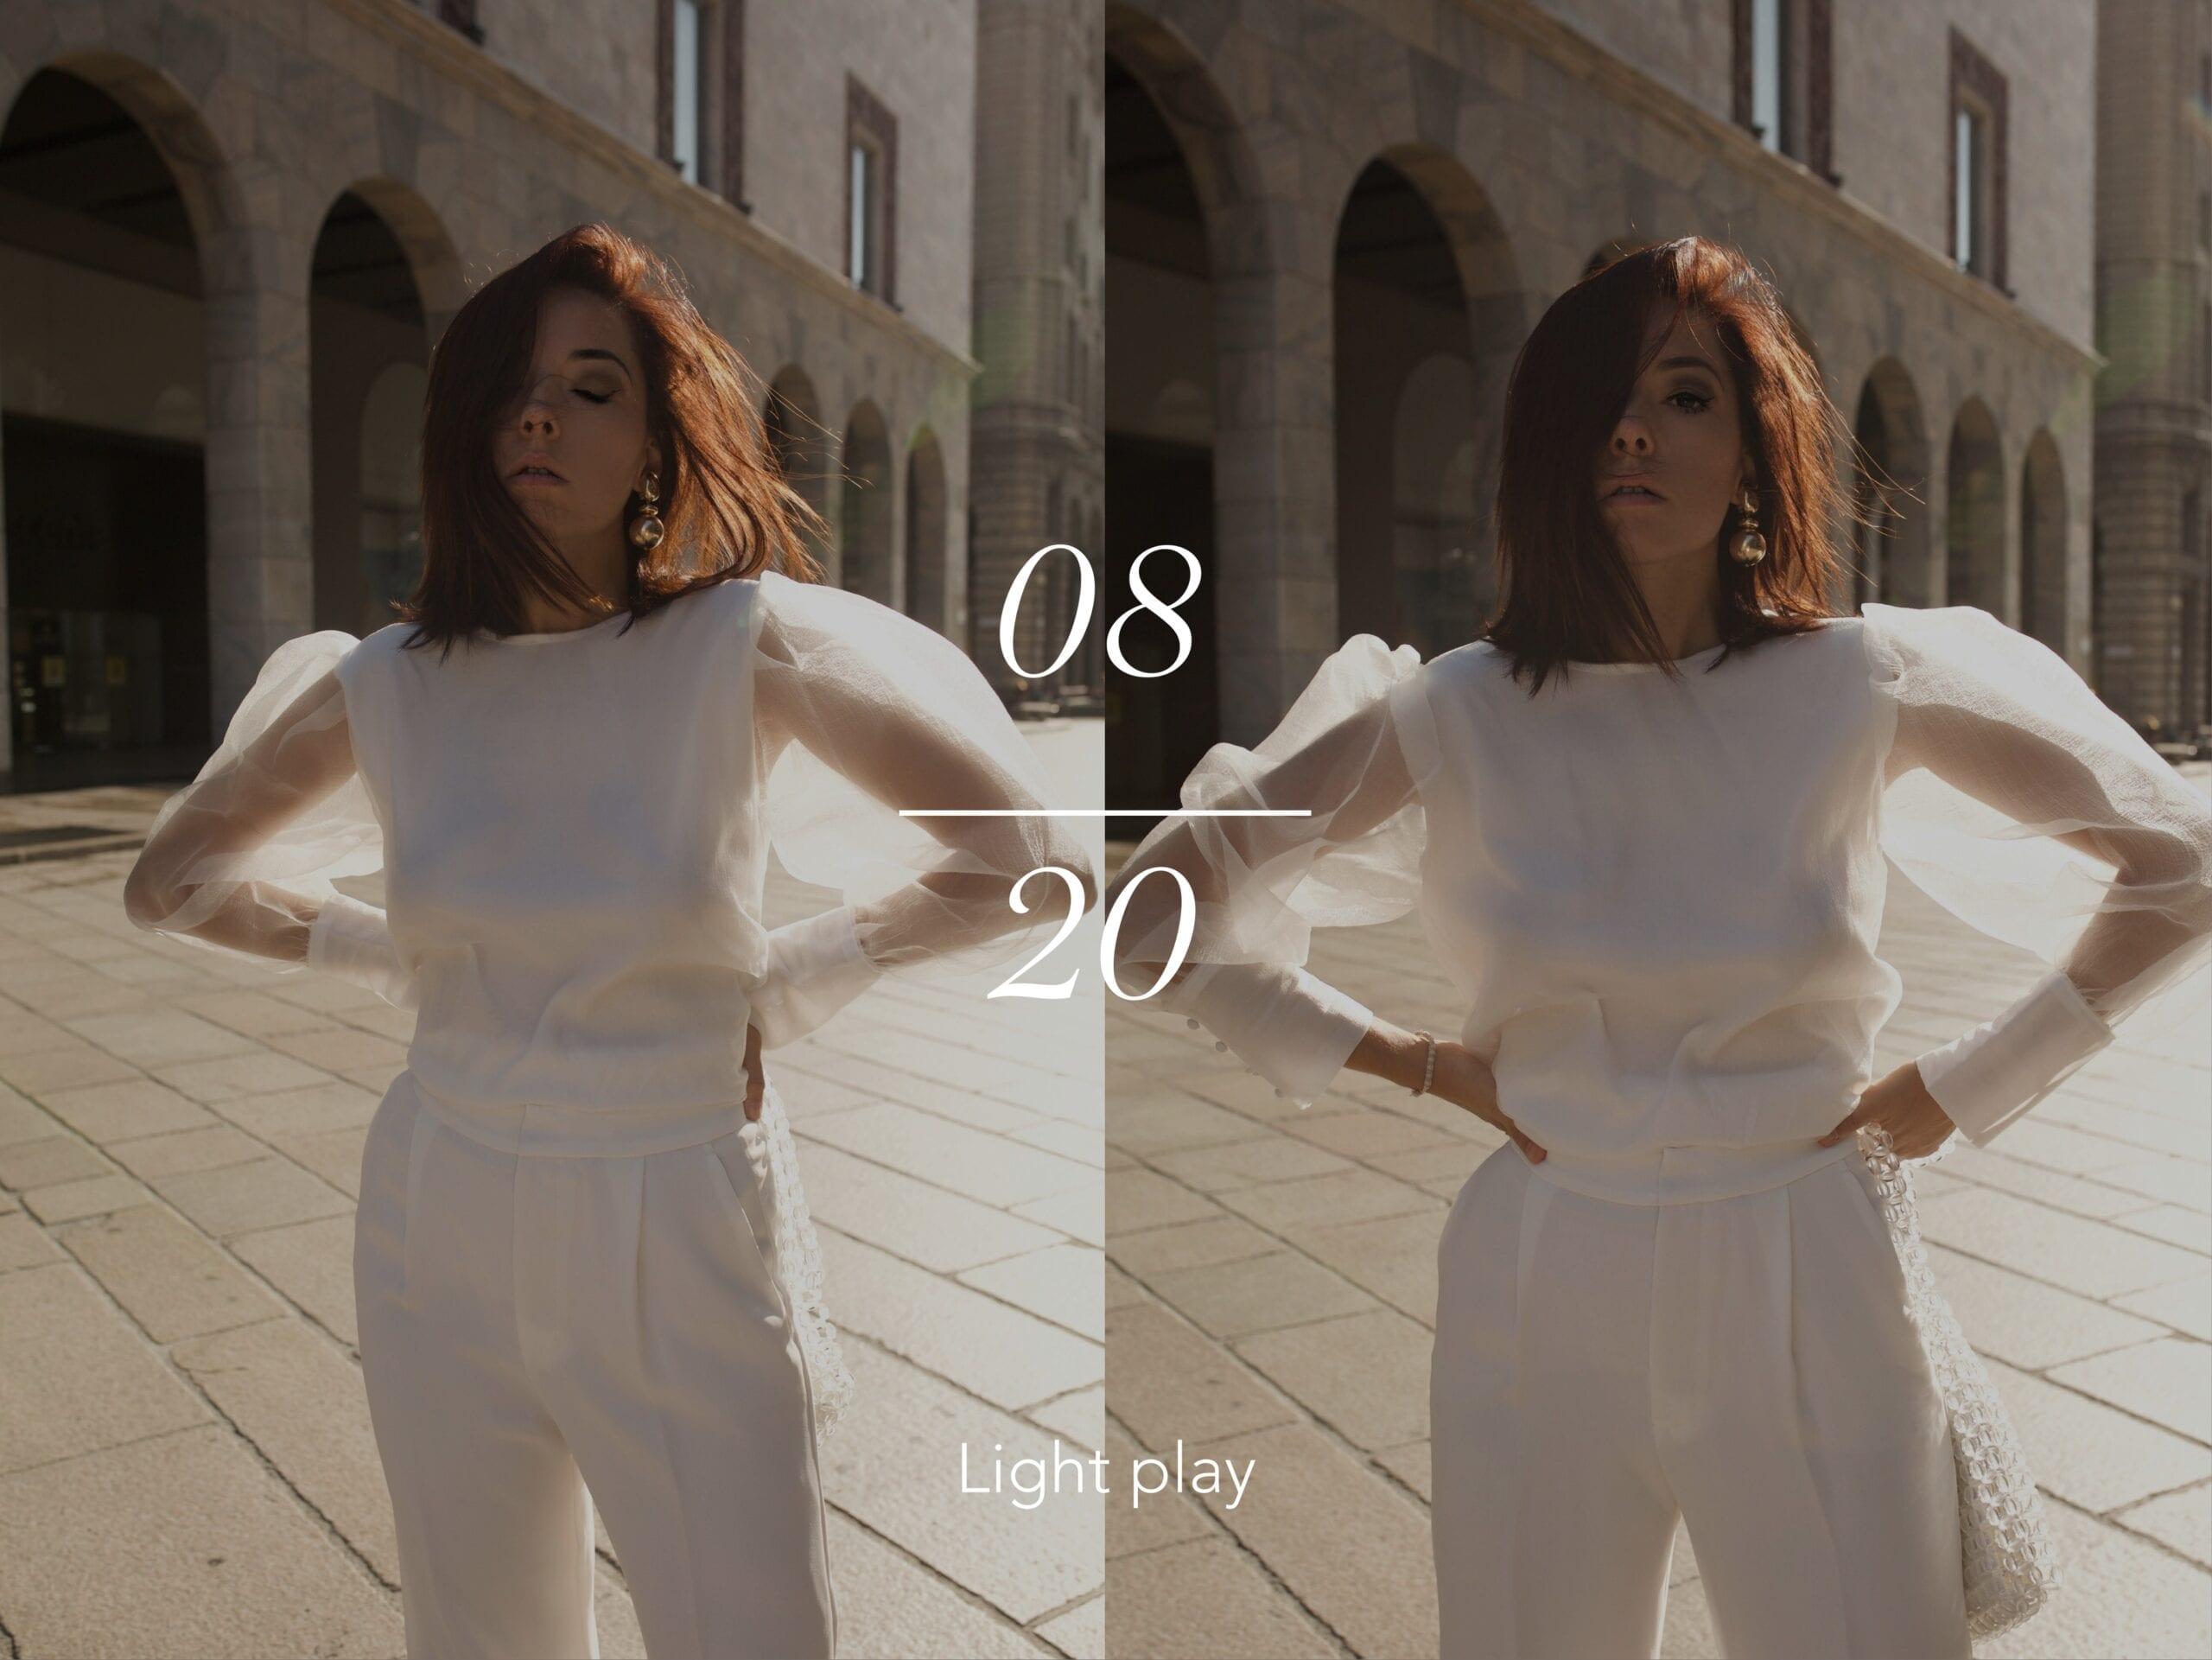 minimal blogger 2019, minimal look blogger 2019, come vestirsi bianco, outfit bianco 2019, elisa bellino, fashion blogger italiane 2019, blogger moda italia 2019, style mafia blouse